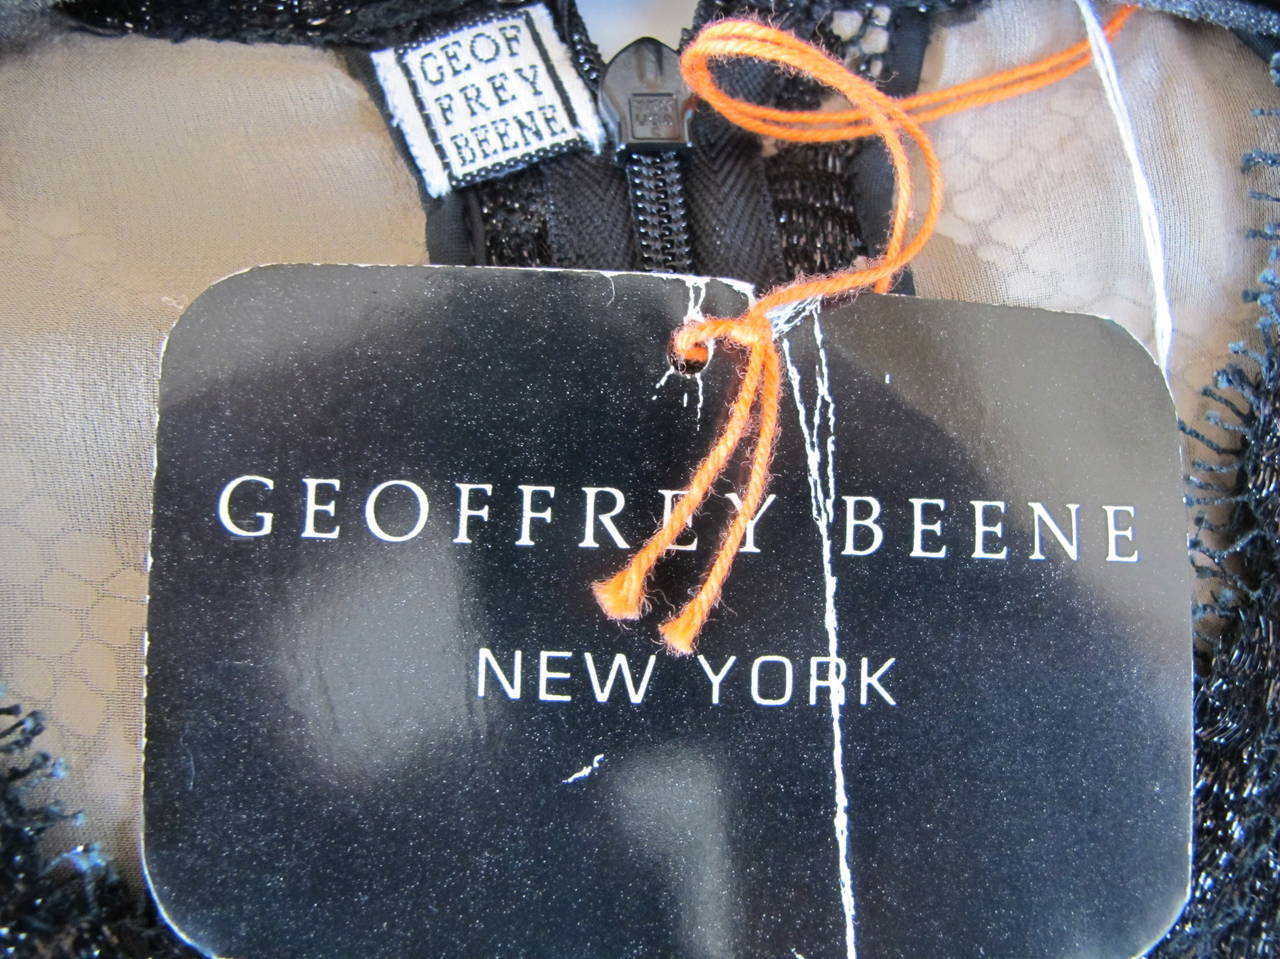 Geoffrey Beene Black Lace Cocktail Dress with Leopard Design 9